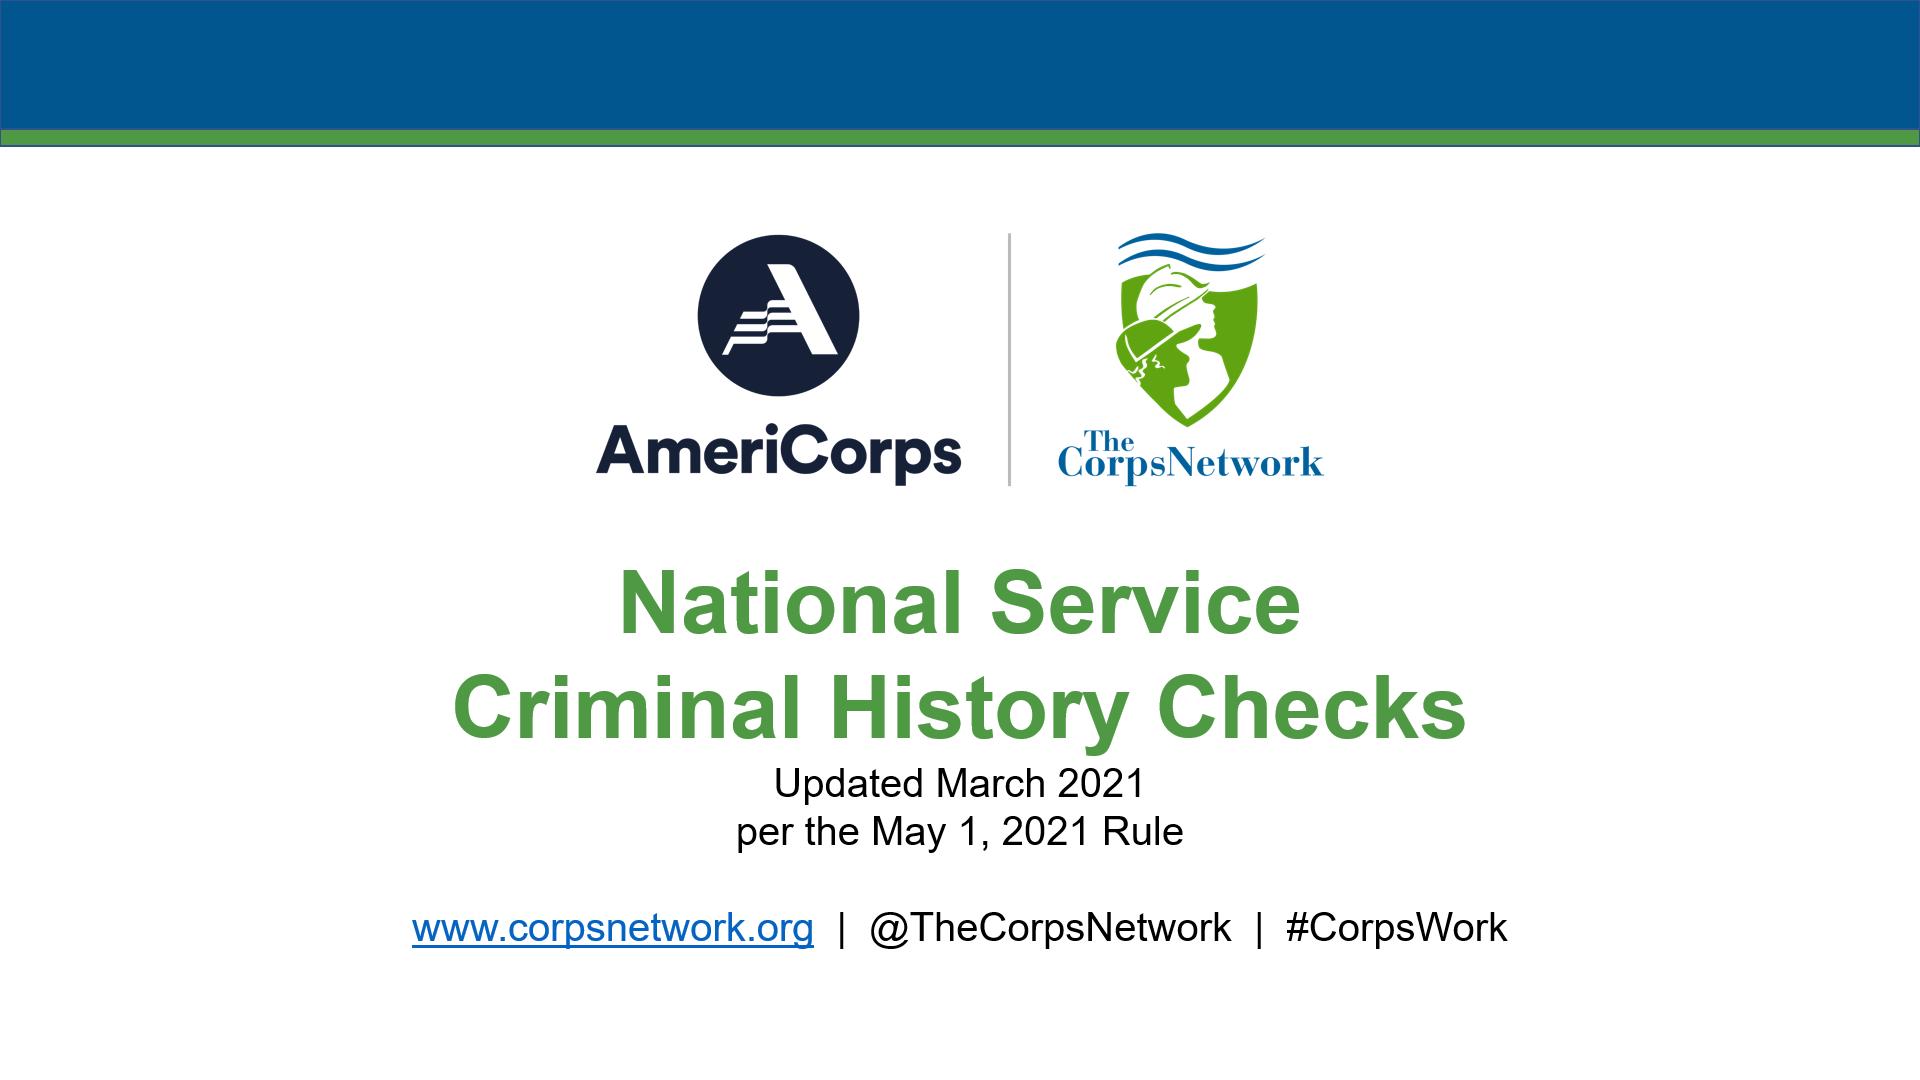 National Service Criminal History Checks